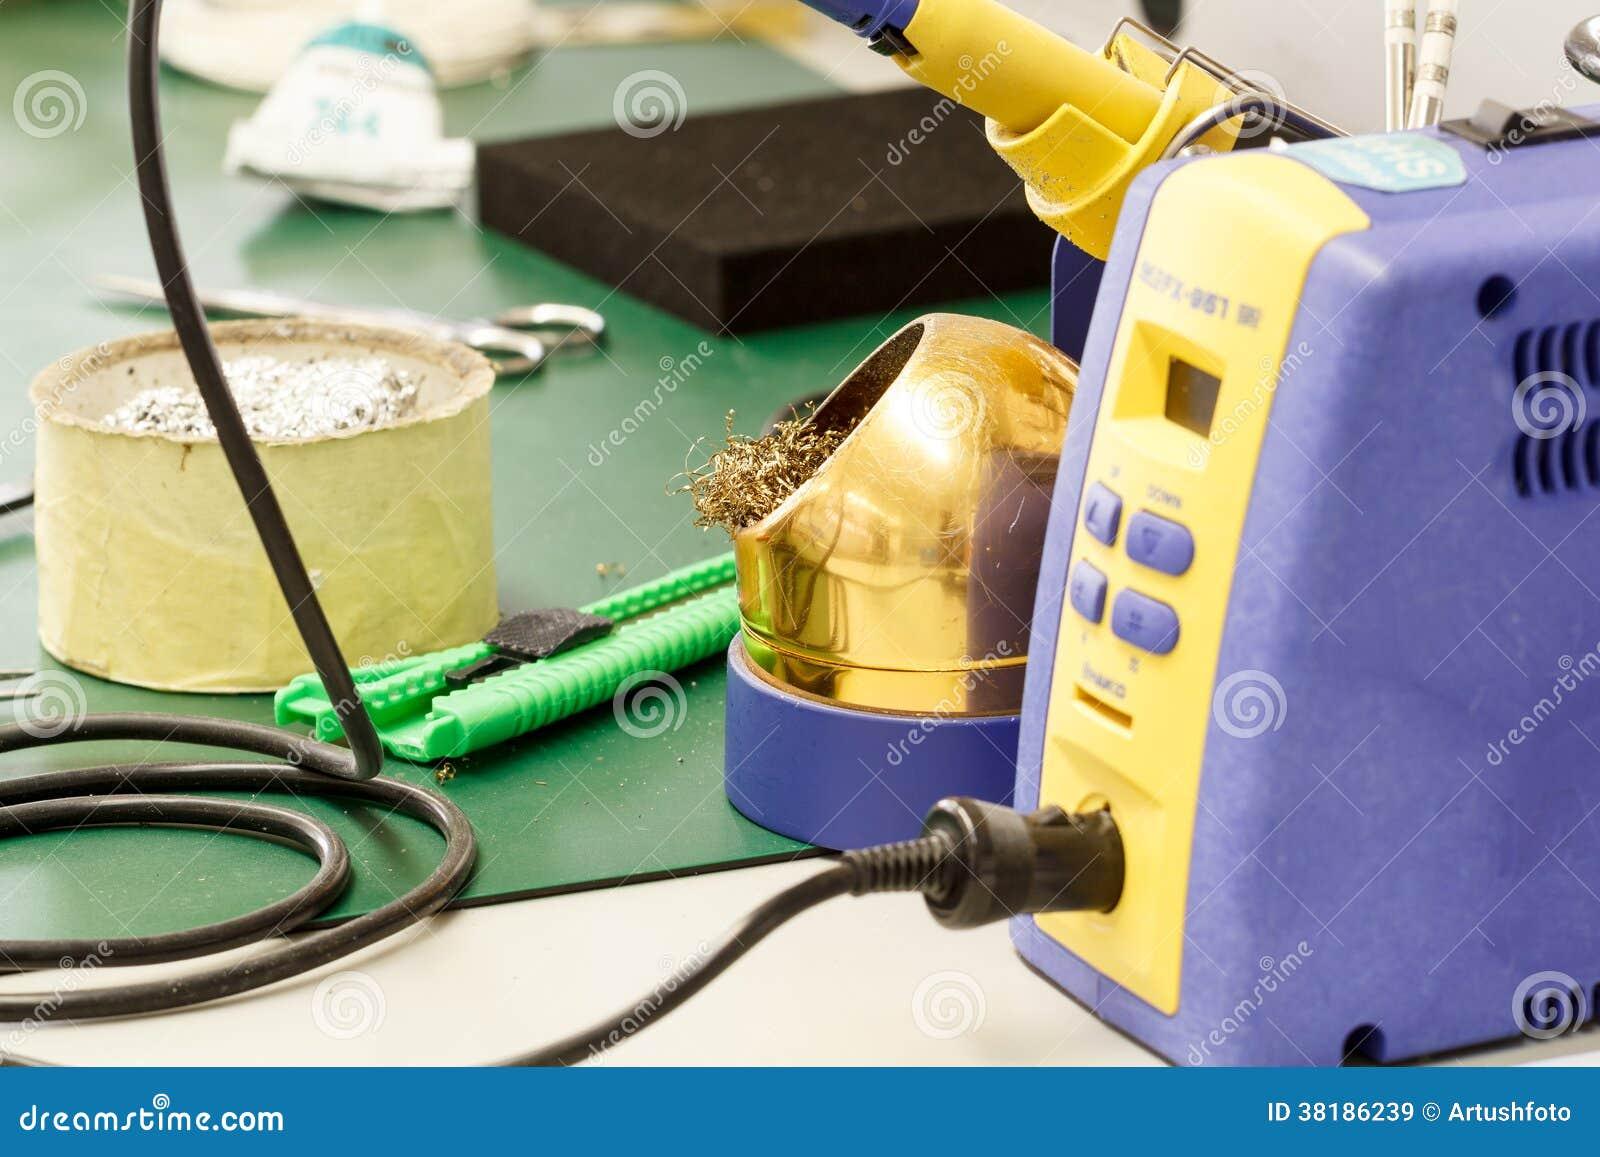 Dign Electronics Factory Equipment Stock Photo Cartoondealer